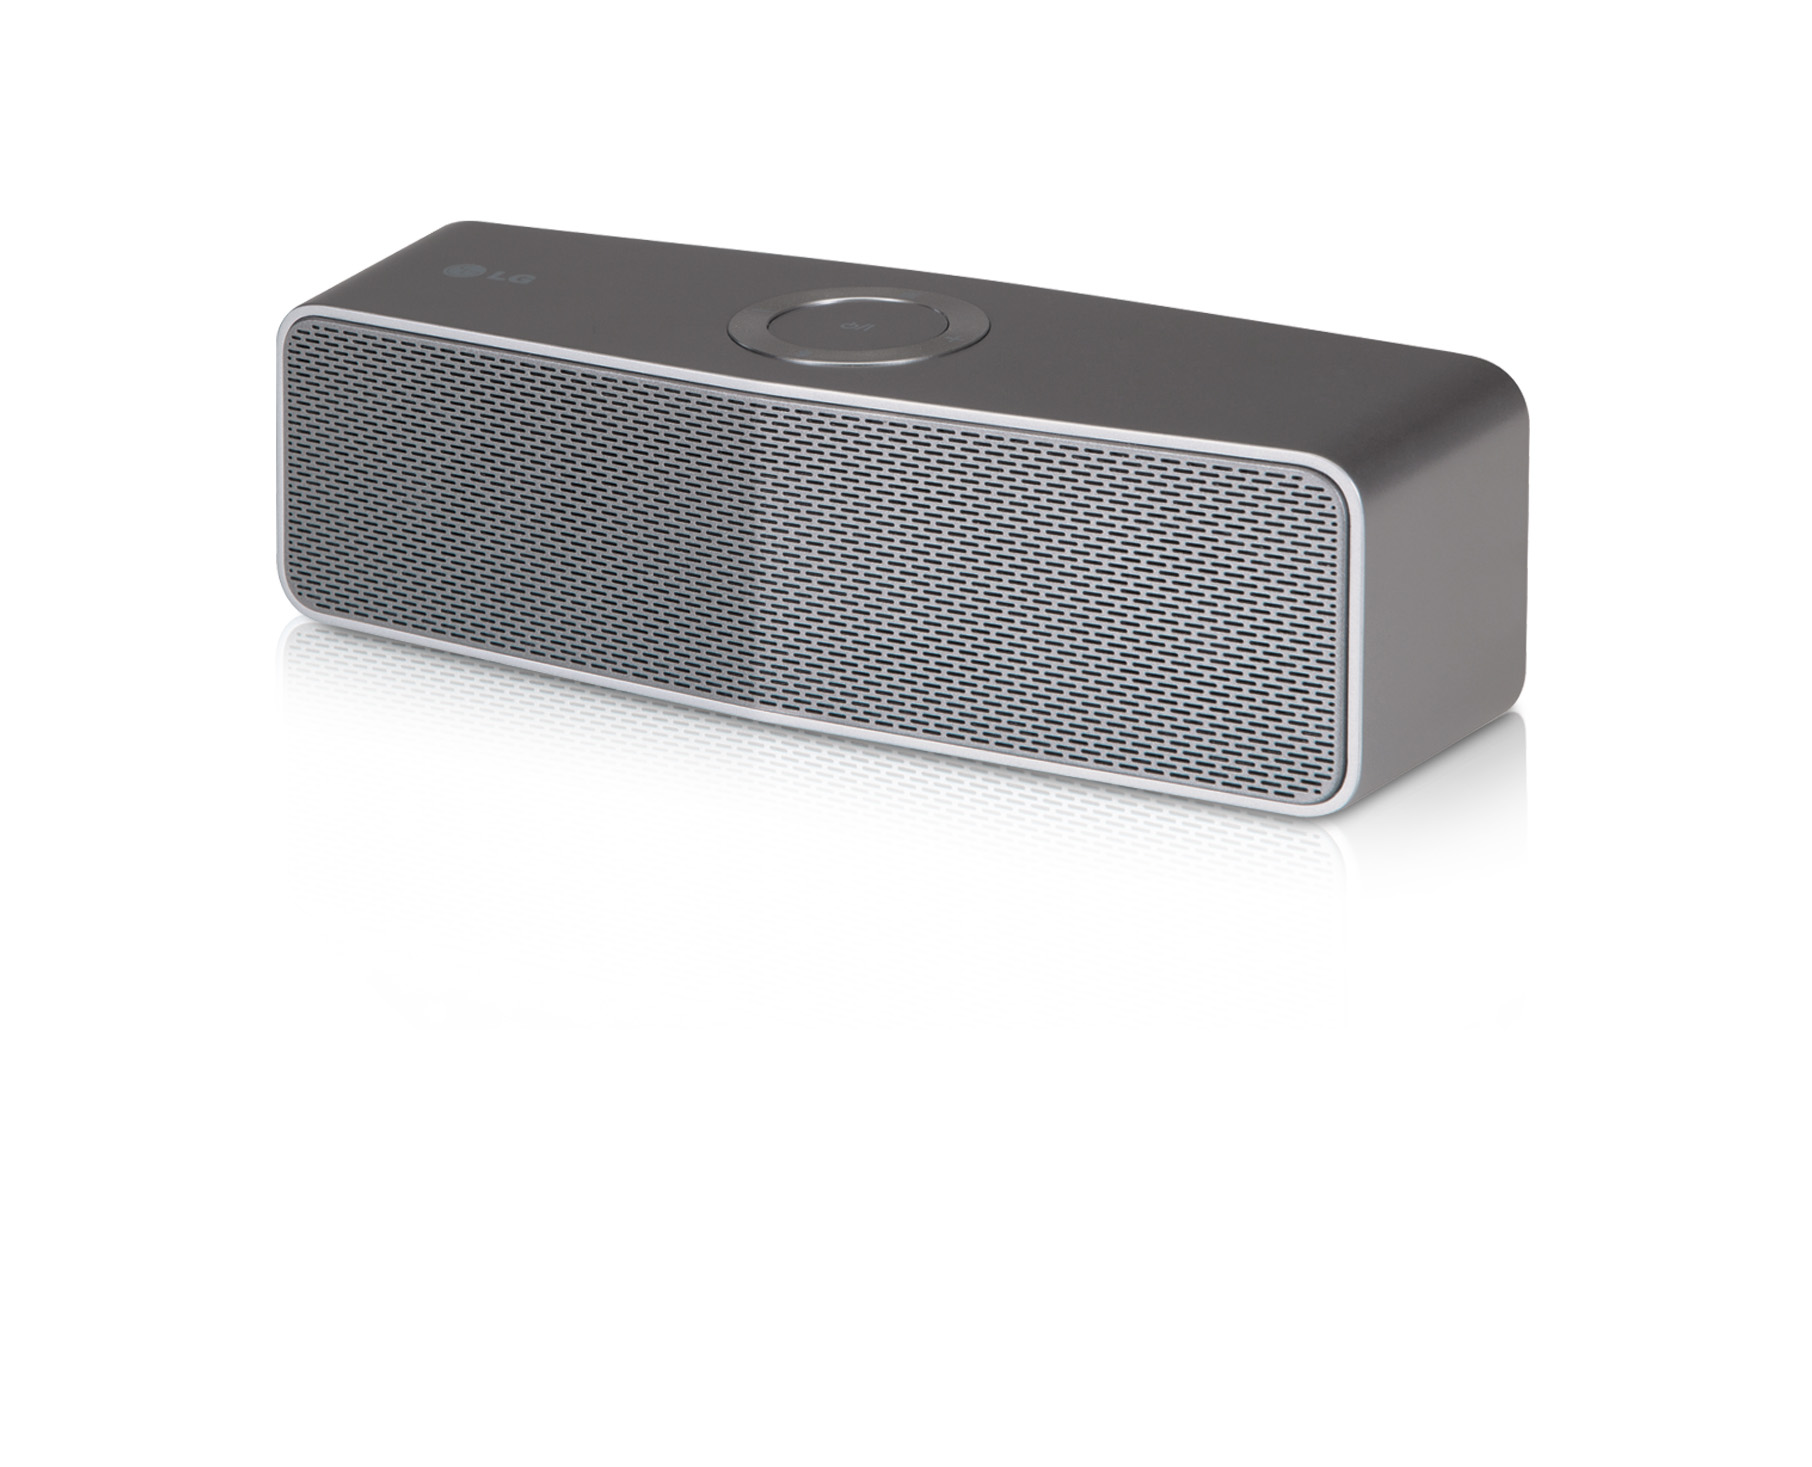 LG_Home_Music_H4_Portable